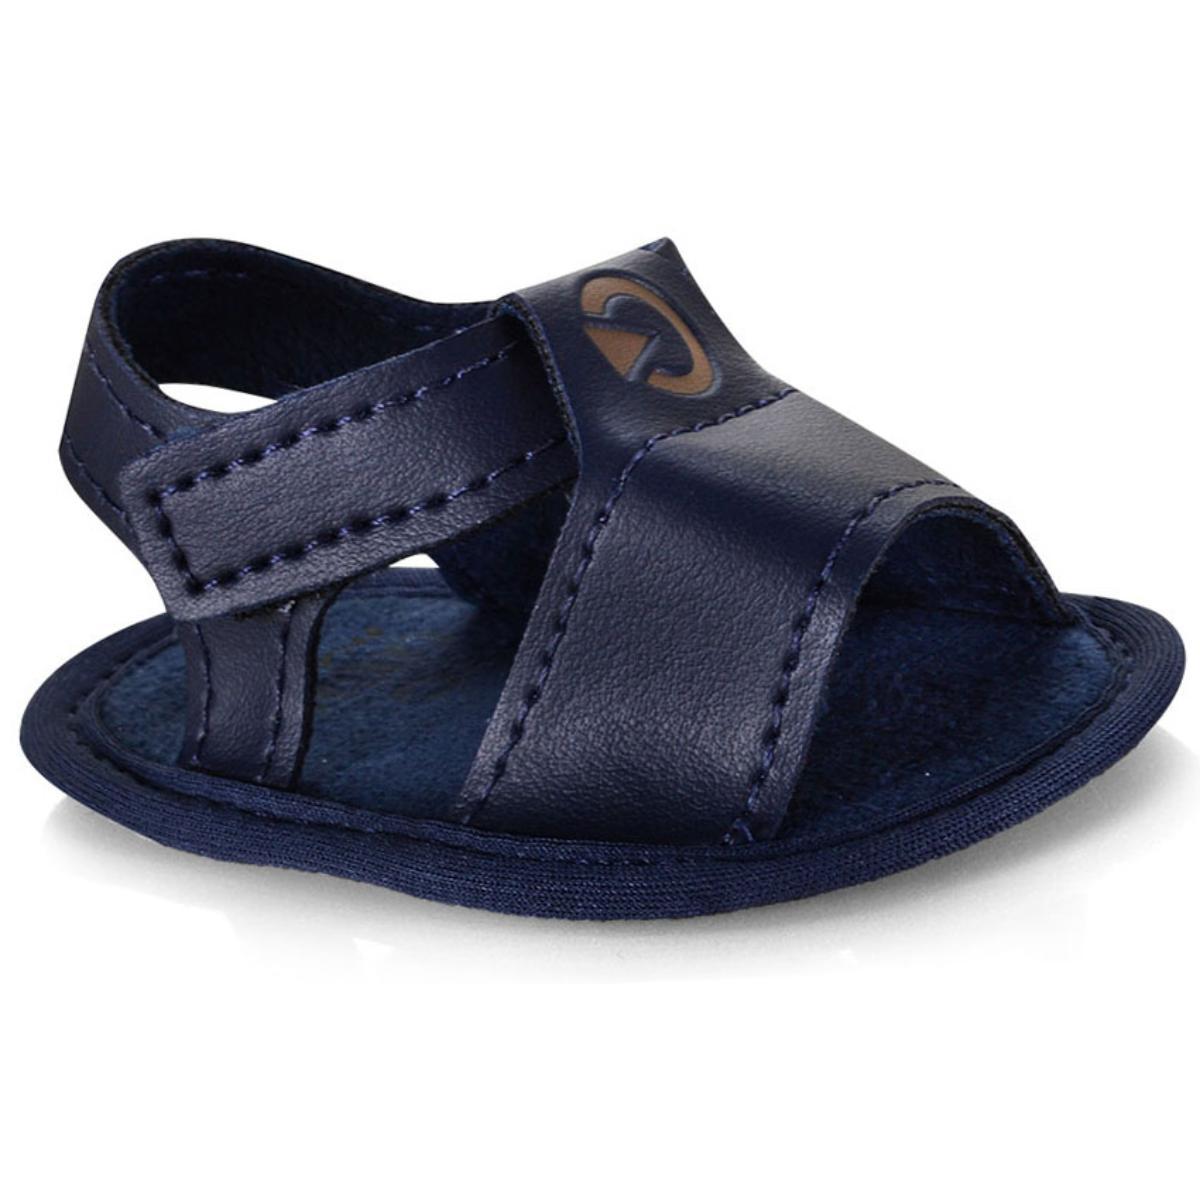 Sandália Masc Infantil Grendene 11537 20729 Cartago Mini rn Azul